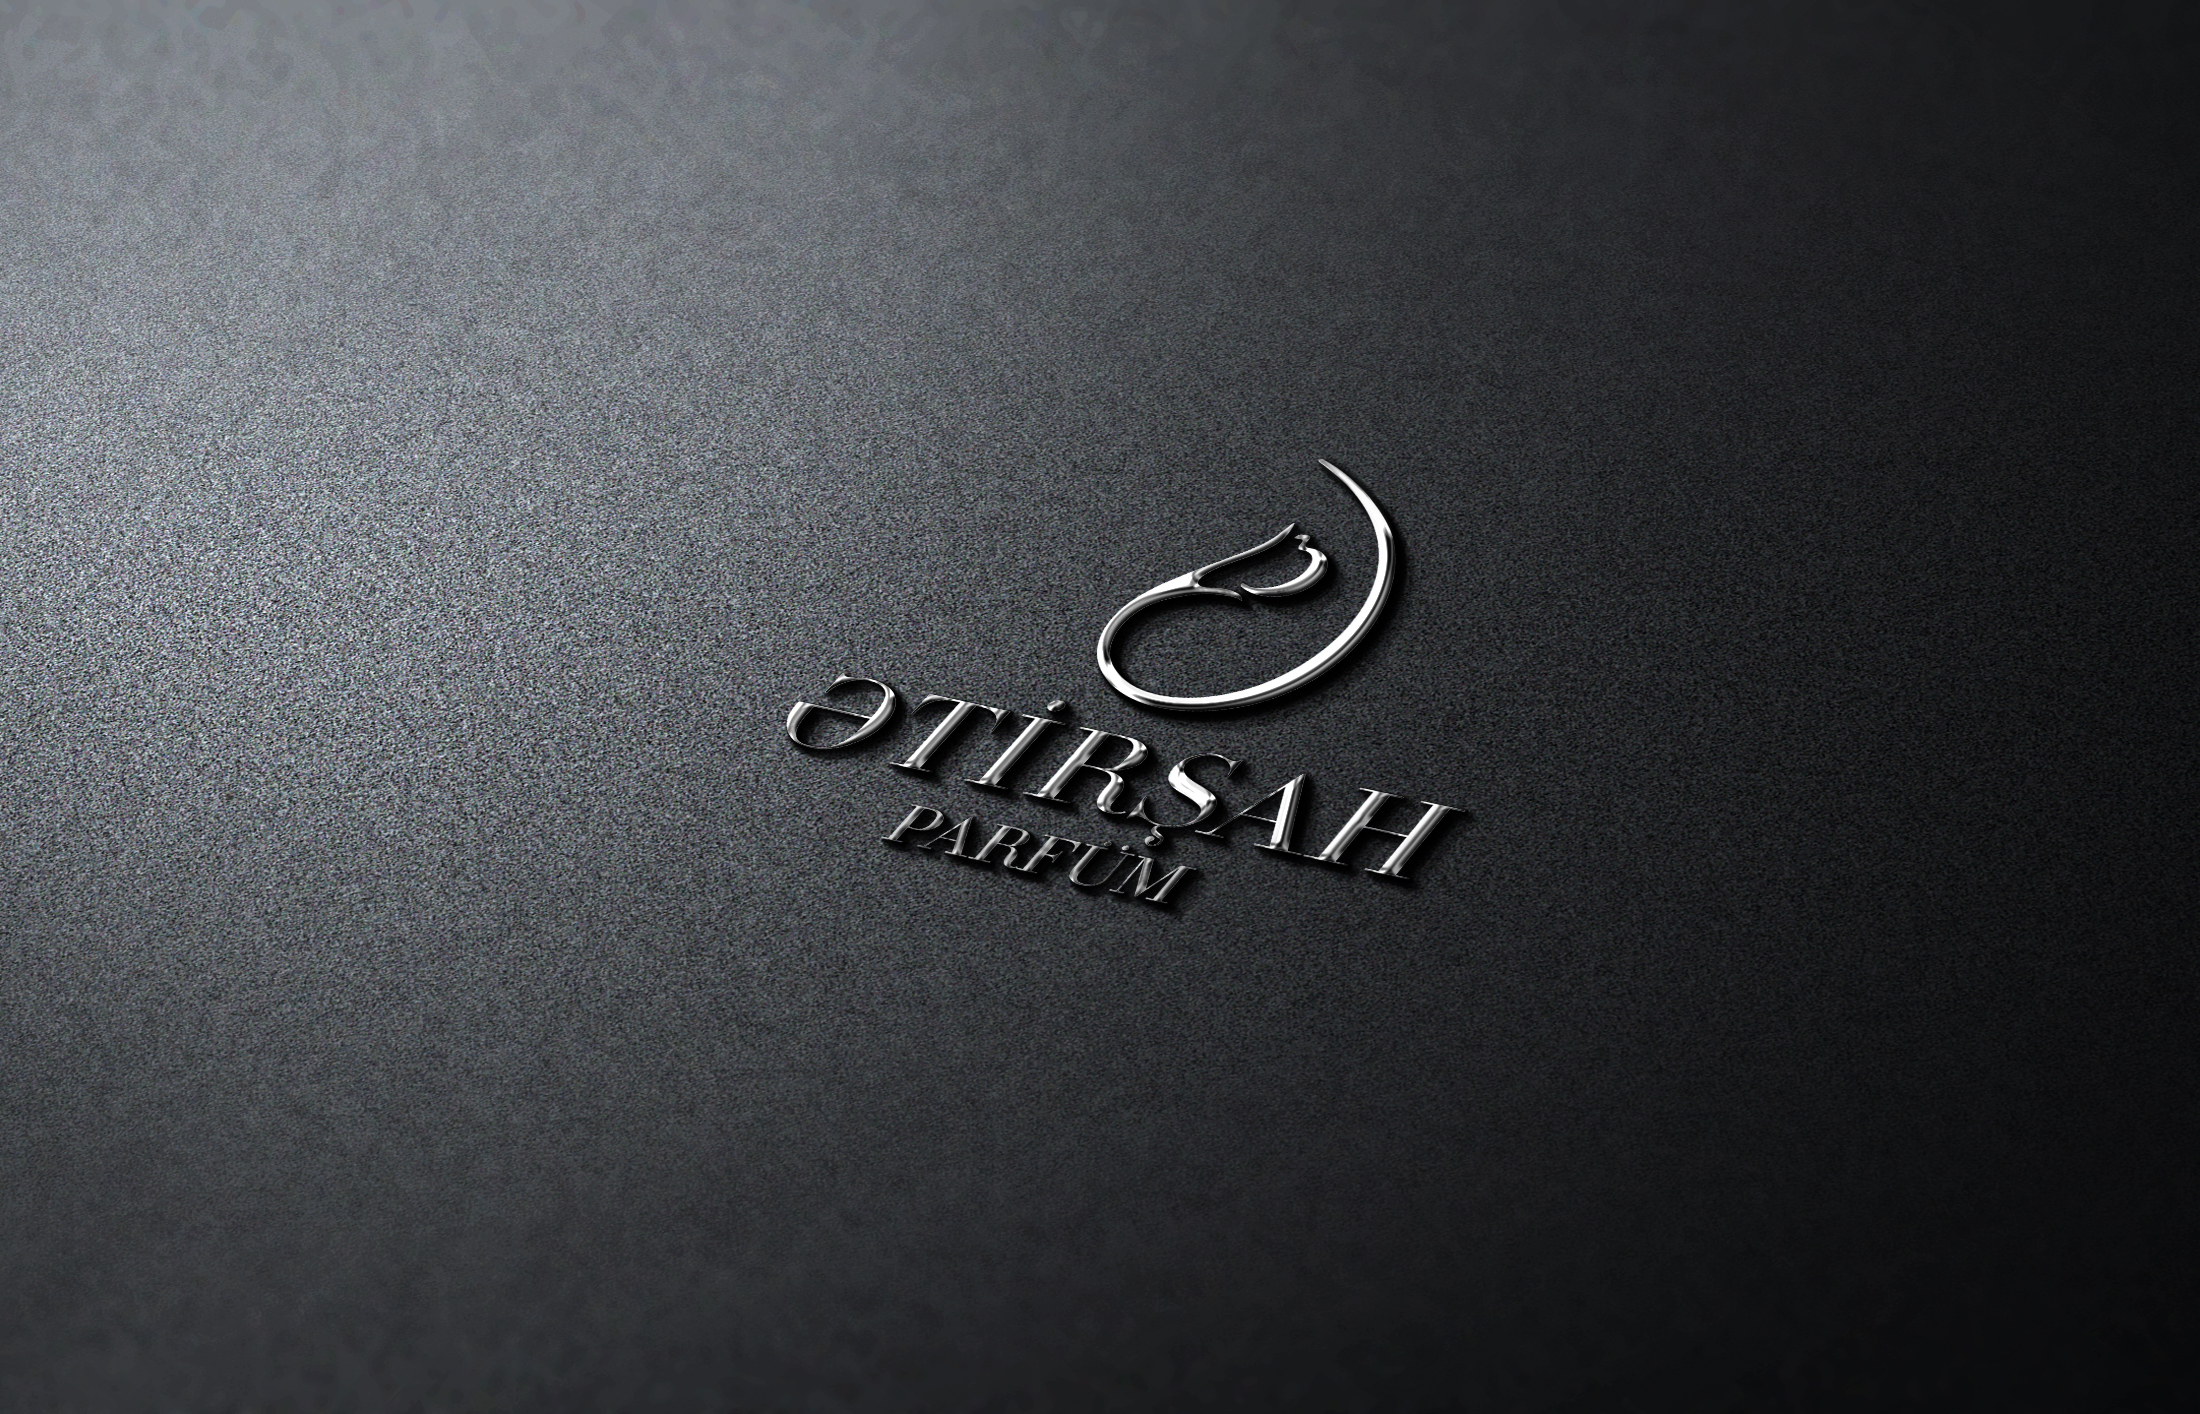 Aston Martin Lagonda Series 2 interior badge